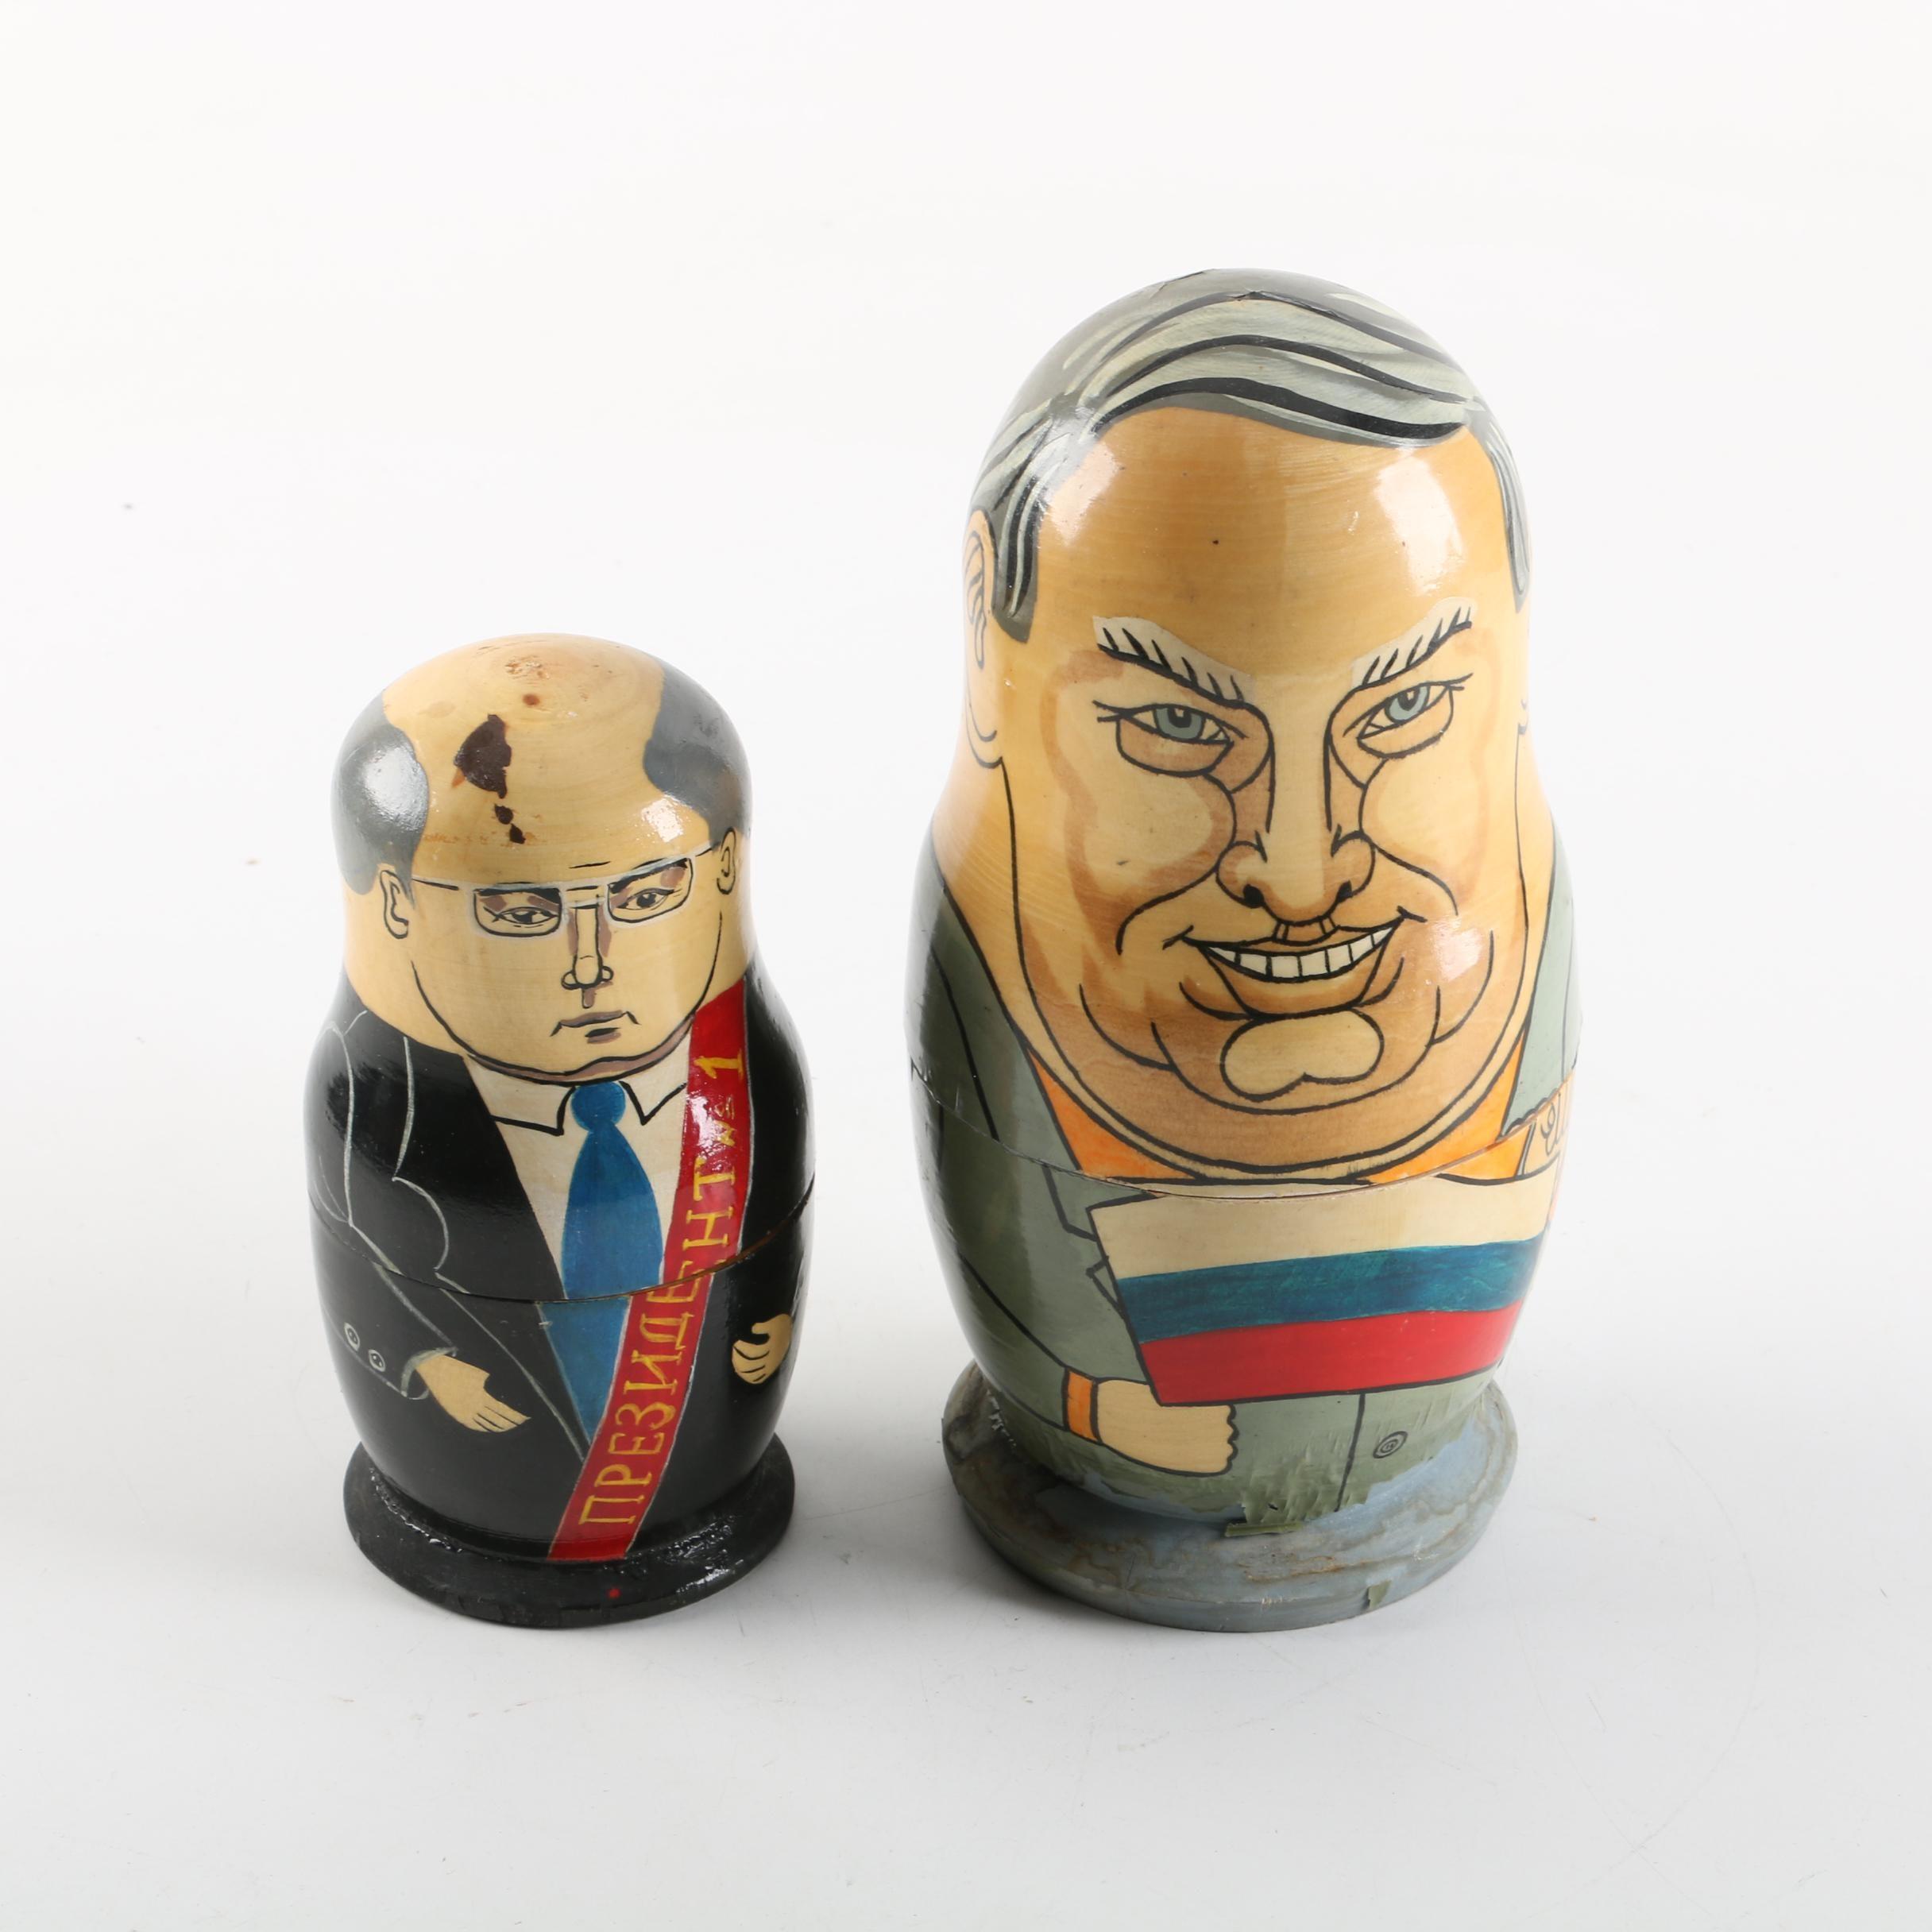 Vintage Hand-Painted Russian Politician Matryoshka Nesting Dolls